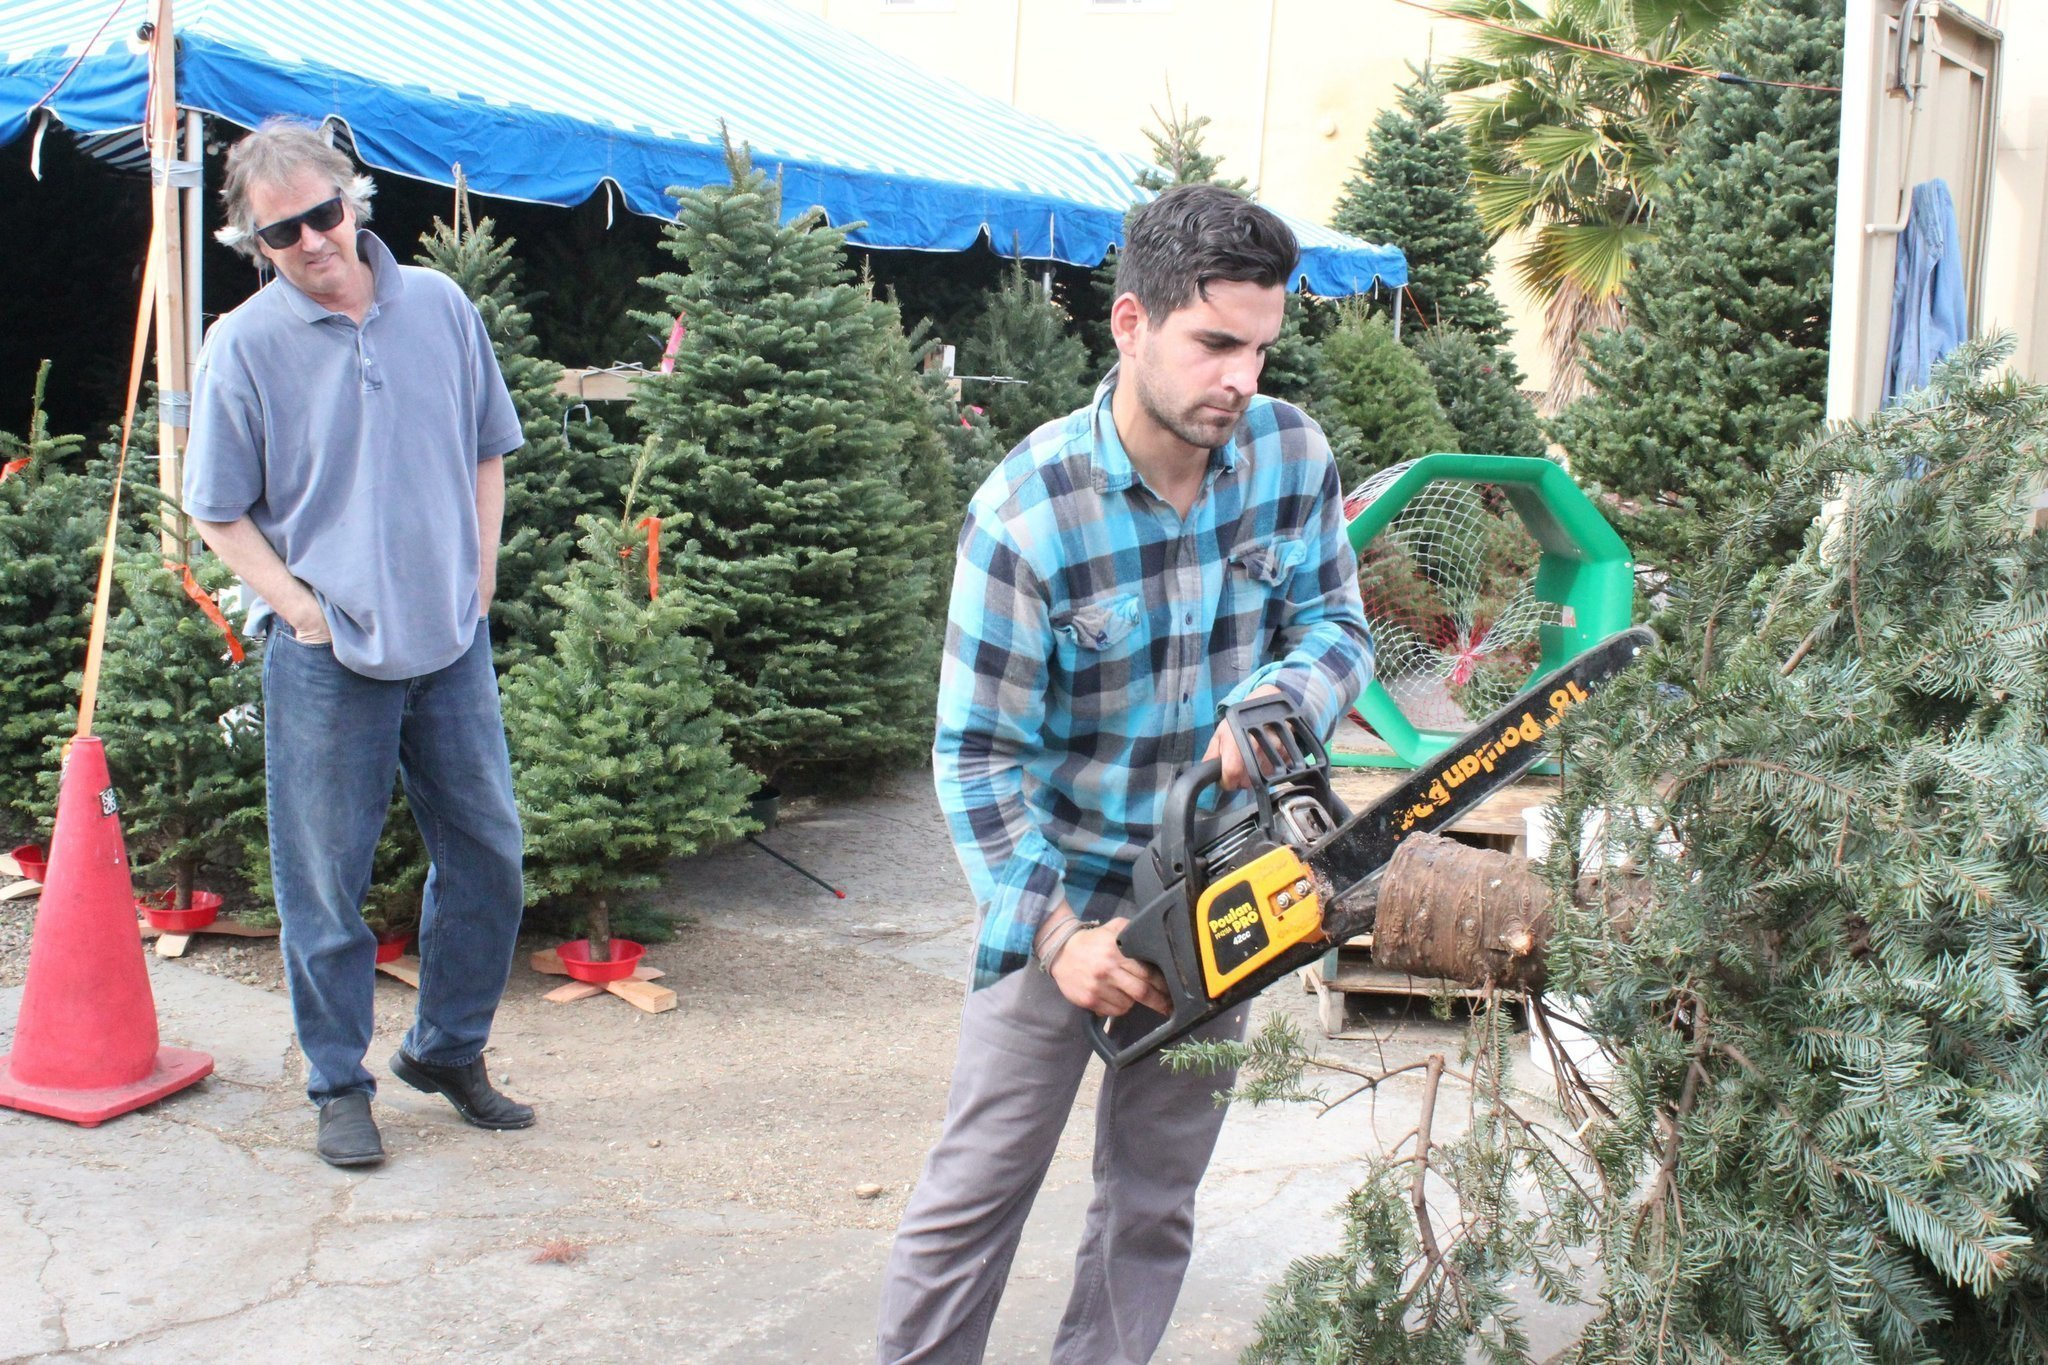 Christmas tree buying in full swing at Mr. Jingle's - La Jolla Light